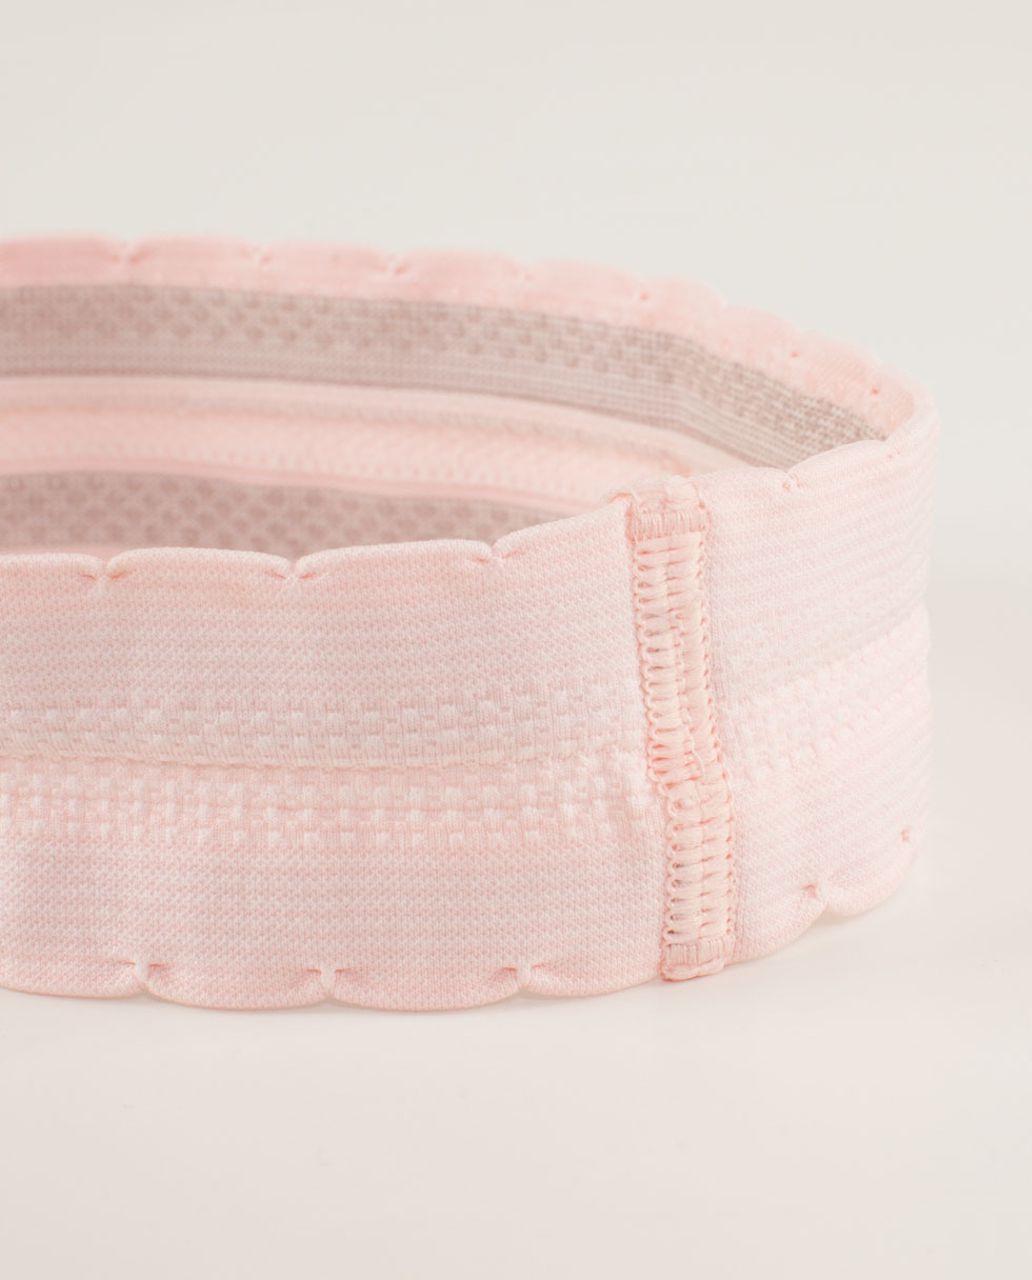 Lululemon Swiftly Headband - Pretty Pink